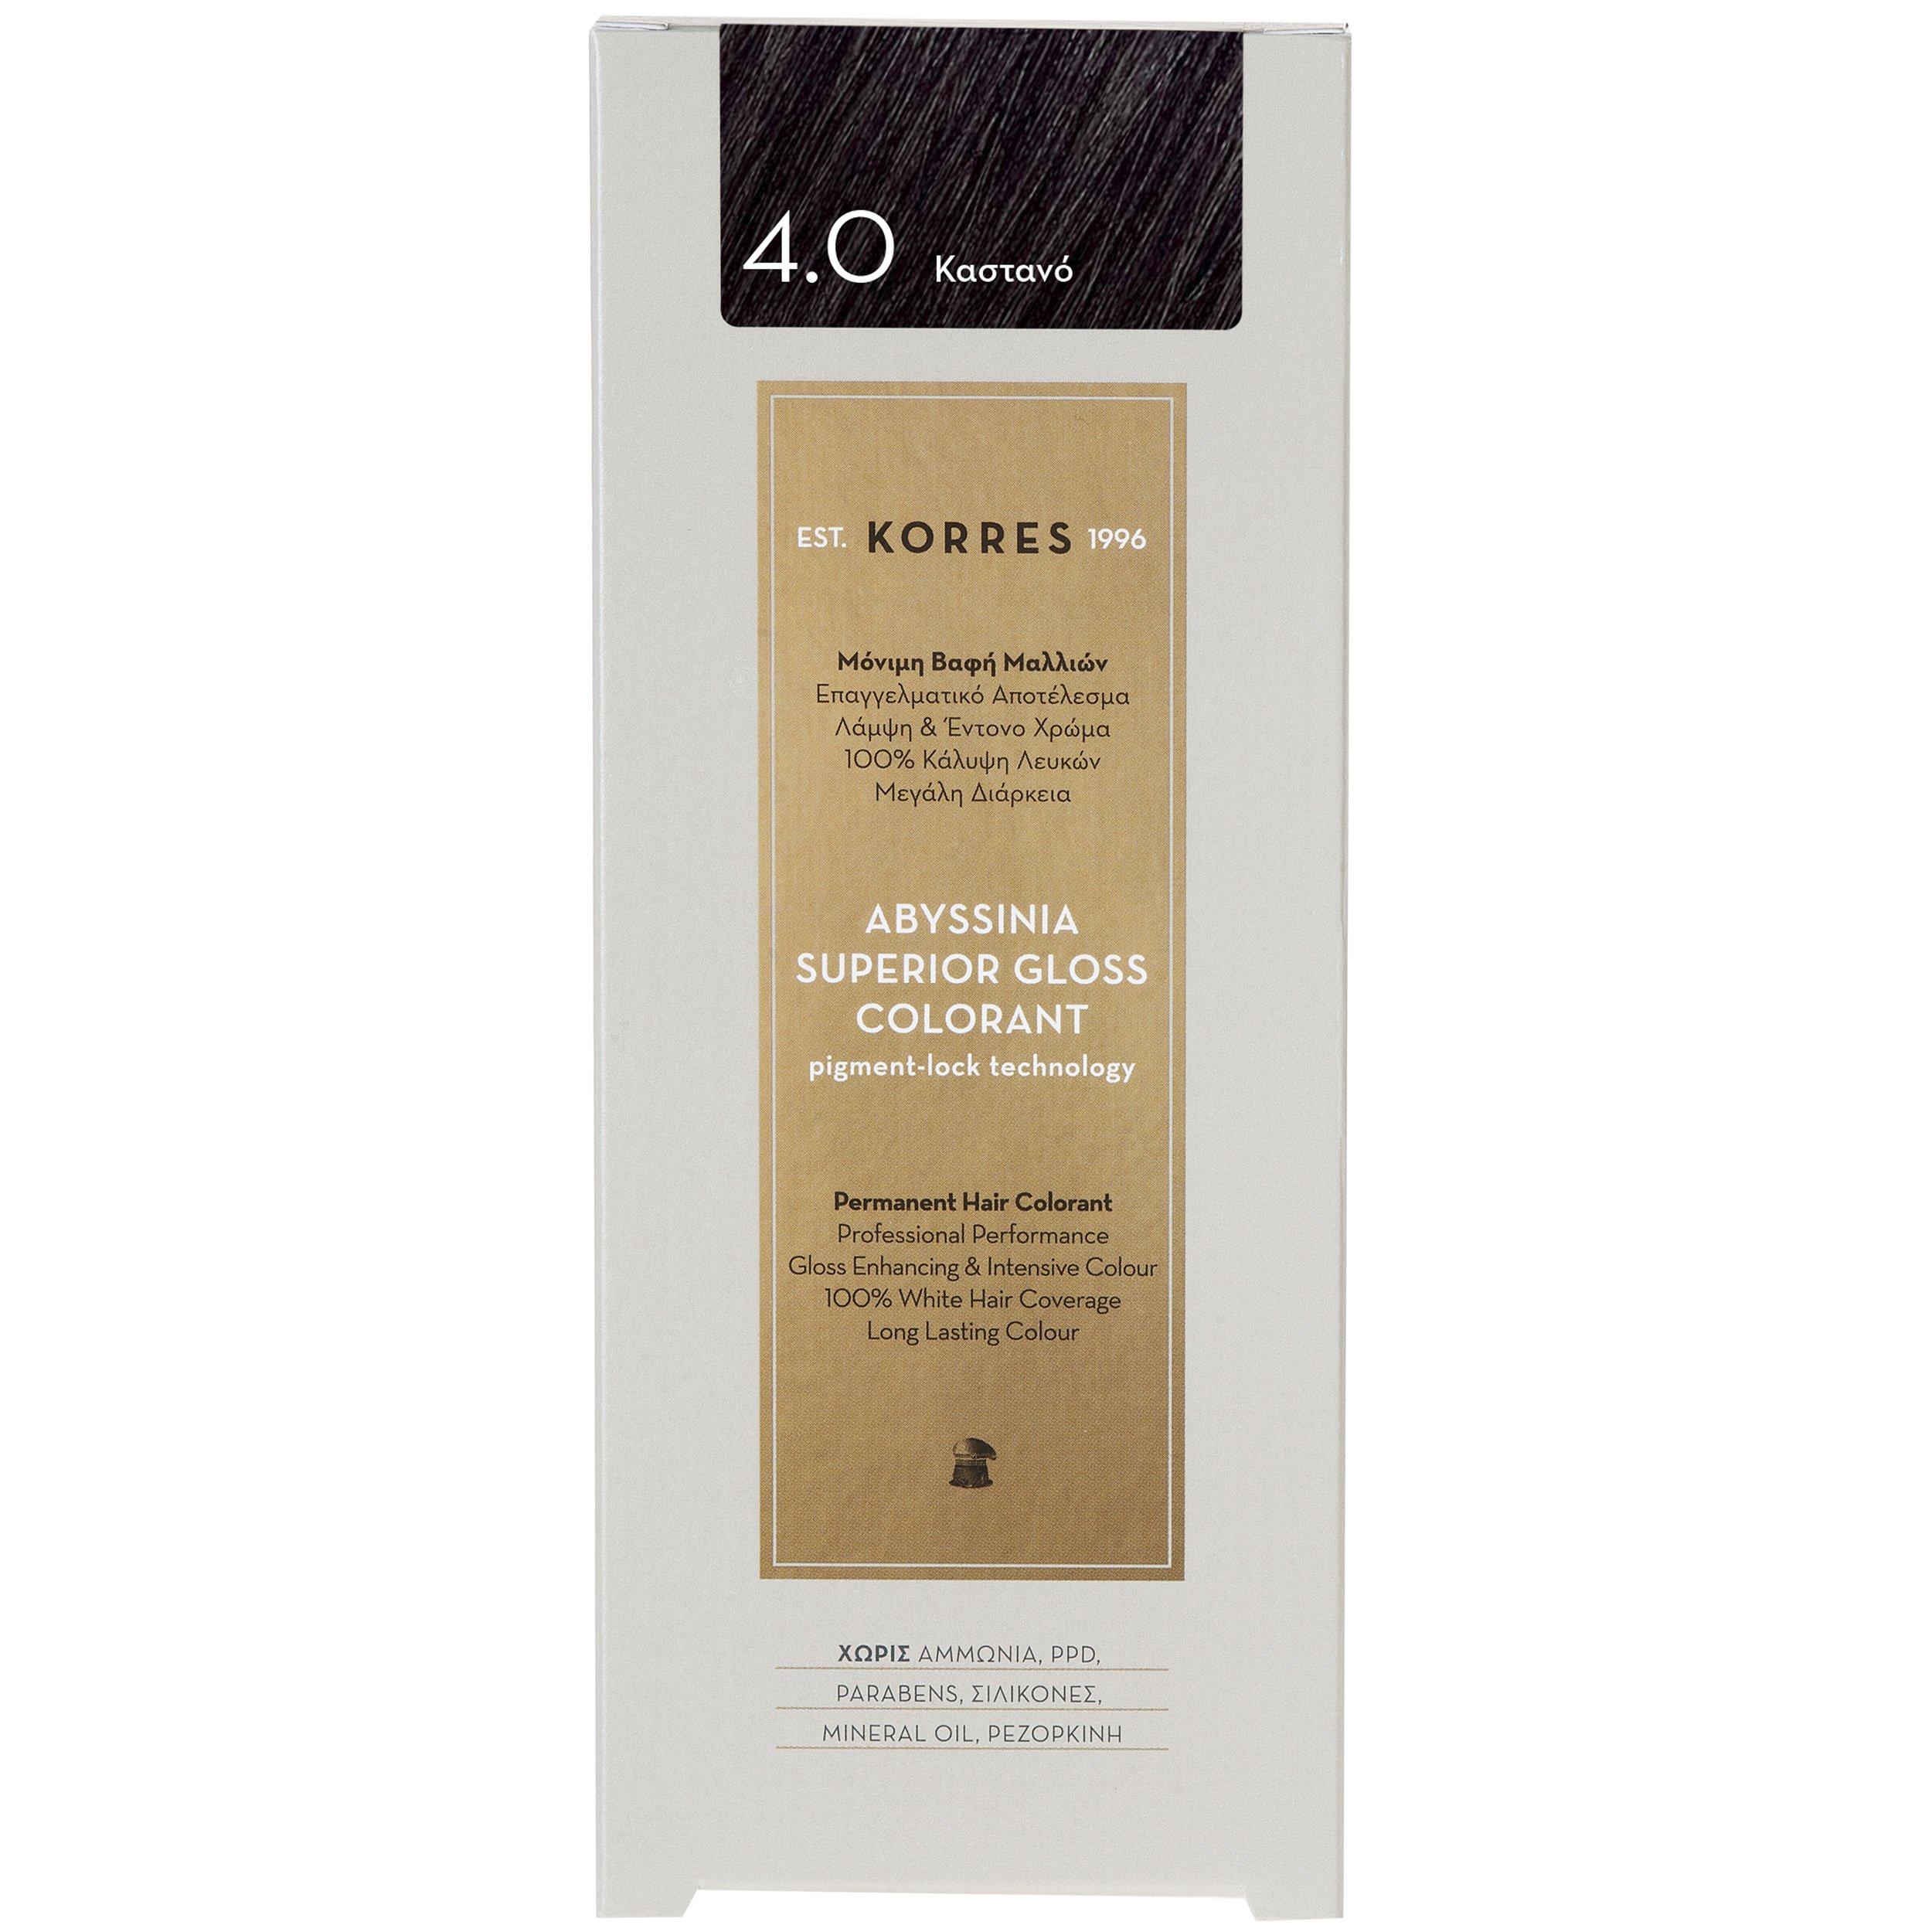 Korres Abyssinia Superior Gloss Colorant Επαγγελματικό Αποτέλεσμα Λάμψη & Έντονο Χρώμα – 4.0 ΚΑΣΤΑΝΟ